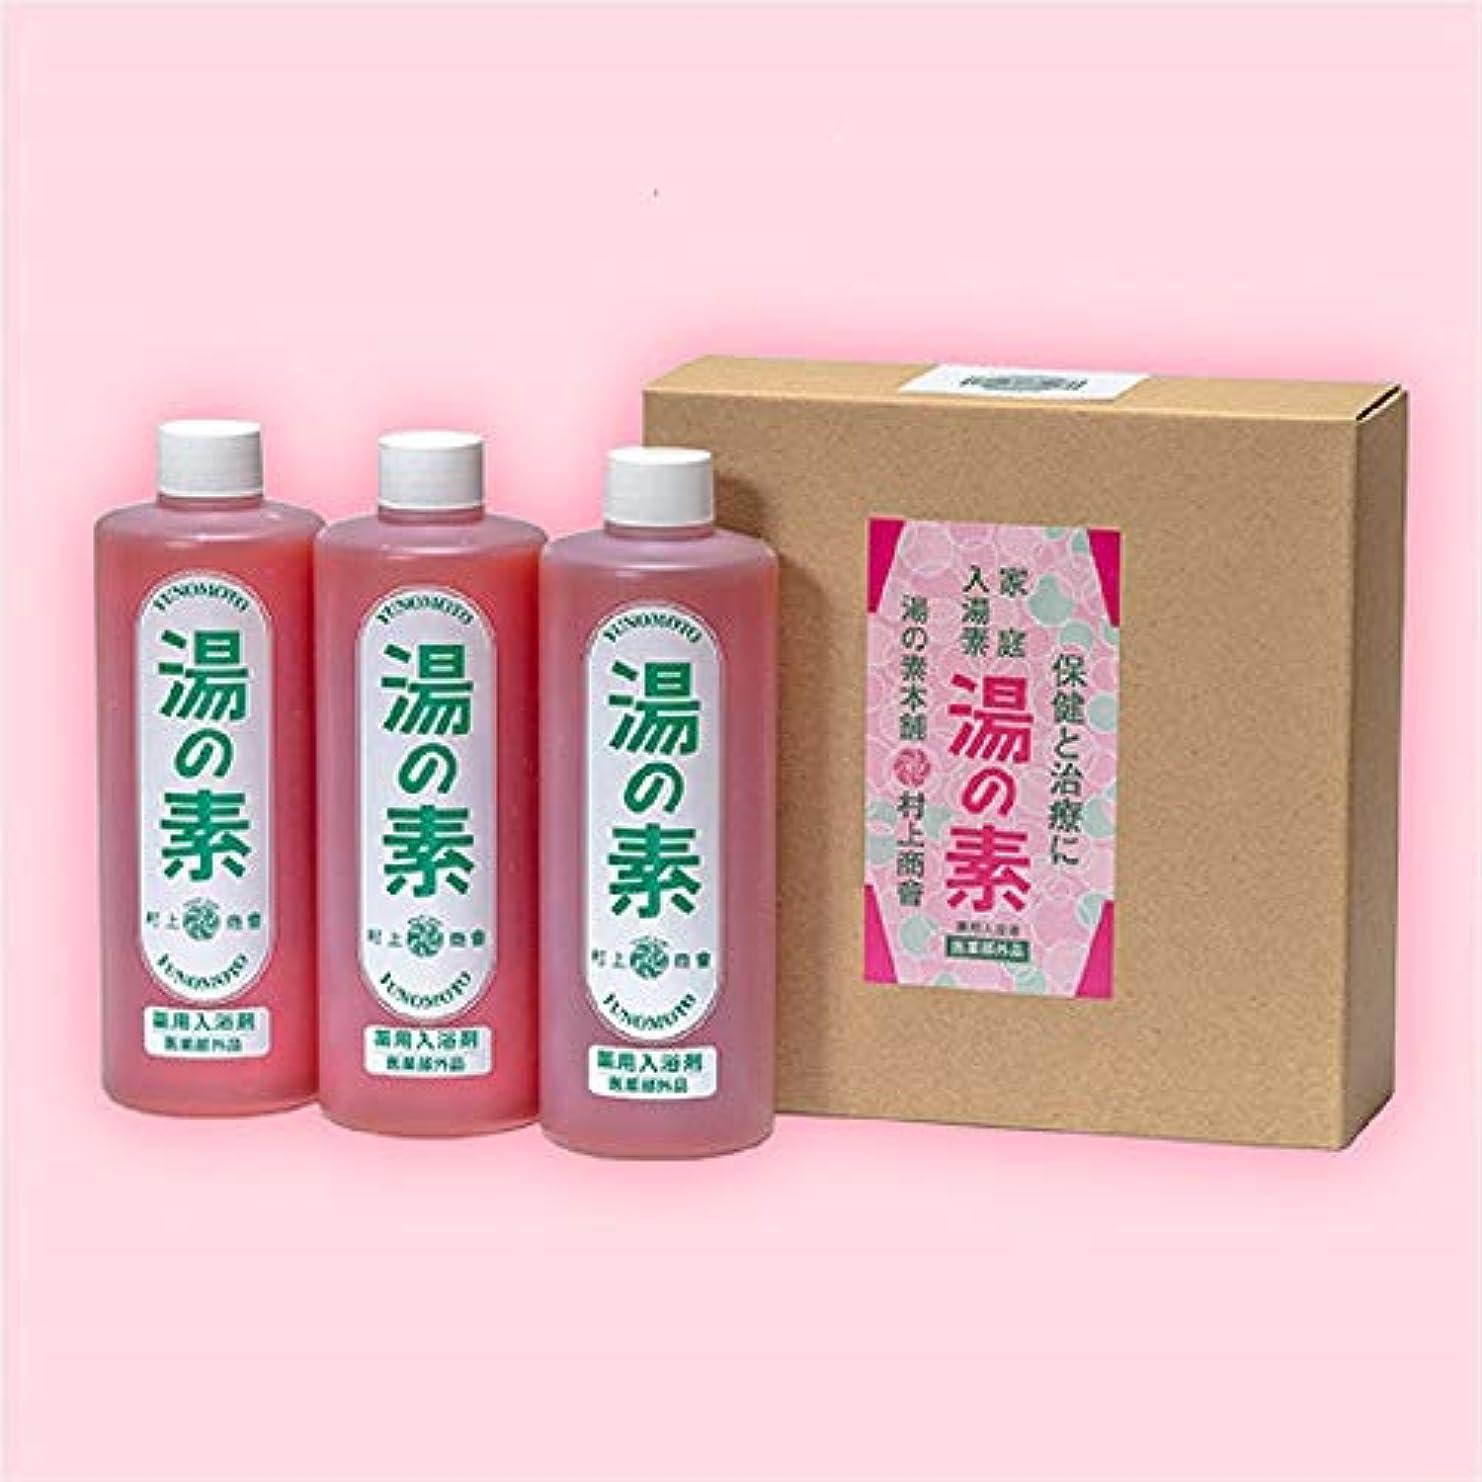 赤面概要無視薬用入浴剤 湯の素 [医薬部外品] 490g(約50回分) 3本セット